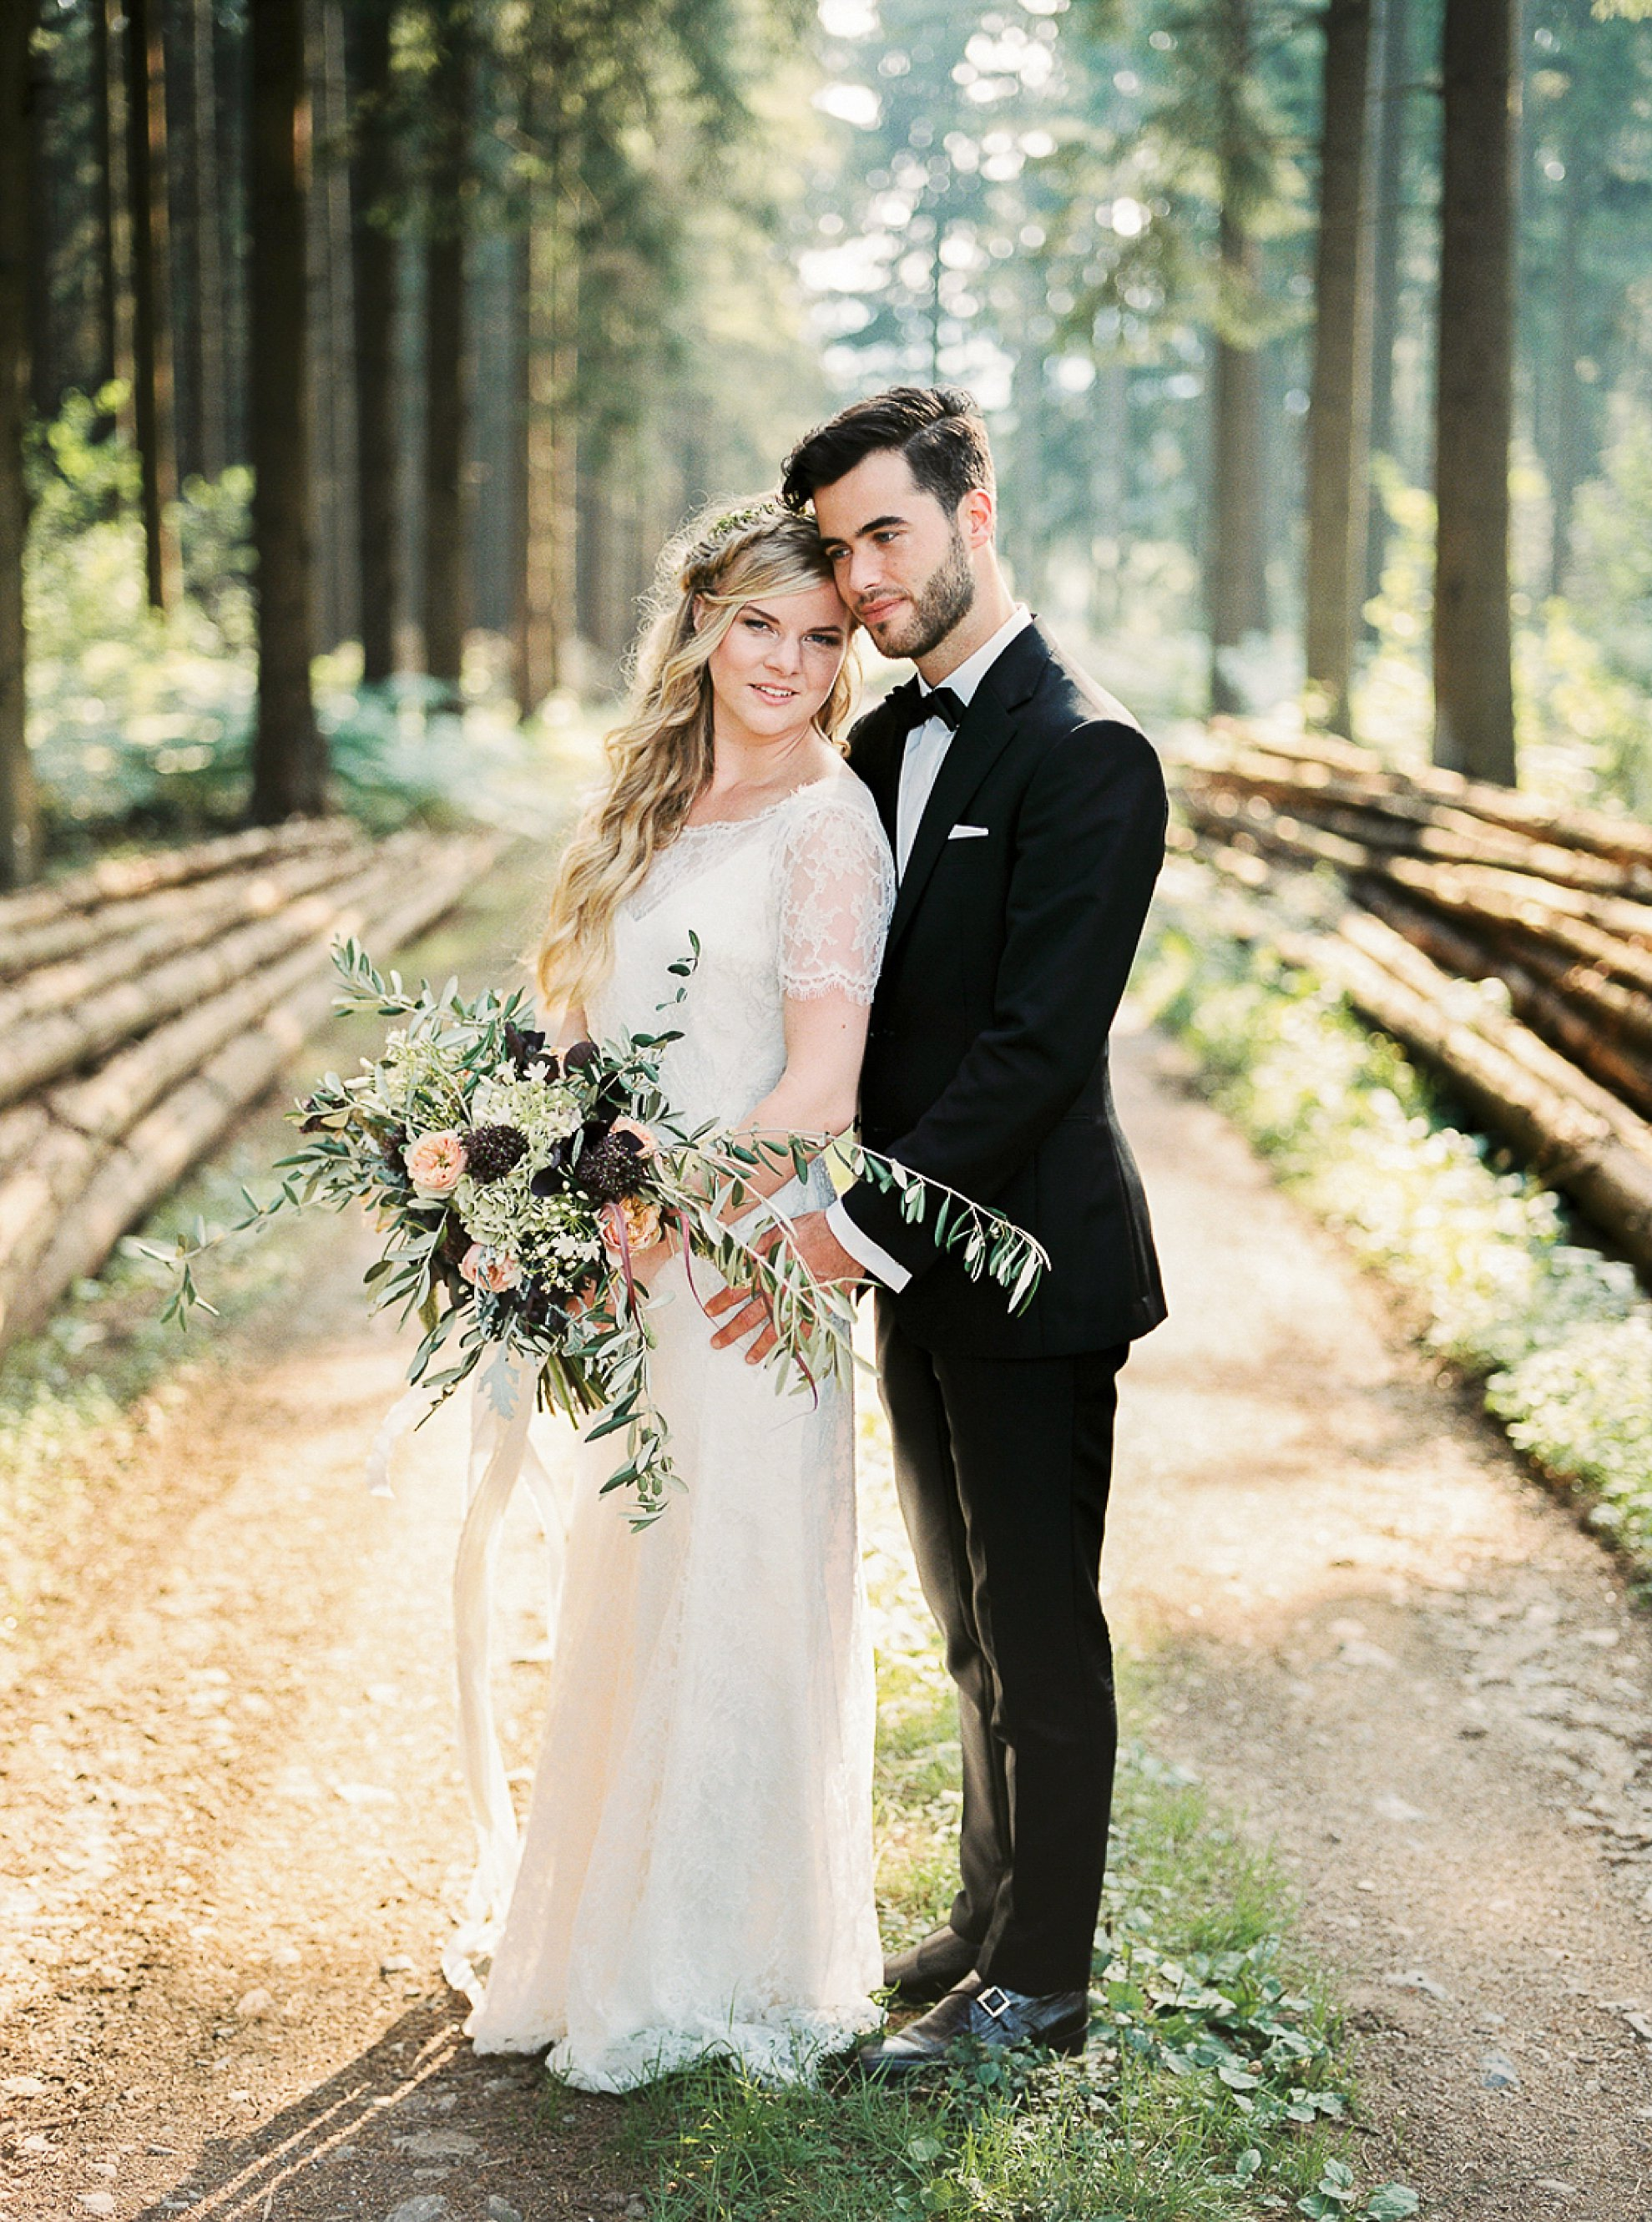 Amanda-Drost-Fotografie-Belgie-Photography-Wedding_0023.jpg